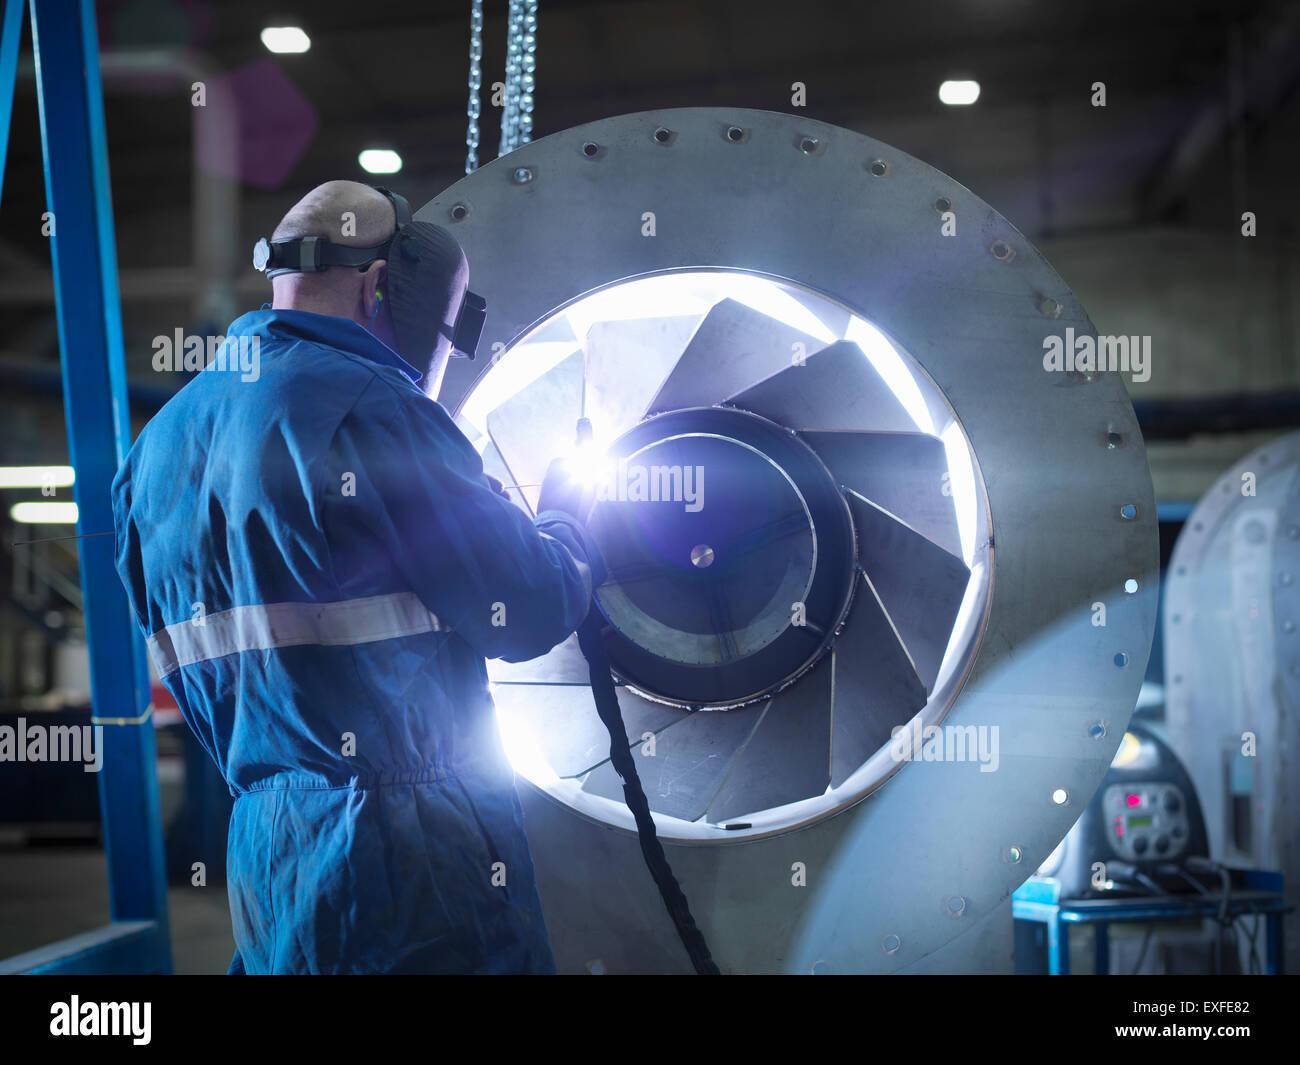 Engineer welding airduct part in engineering factory - Stock Image